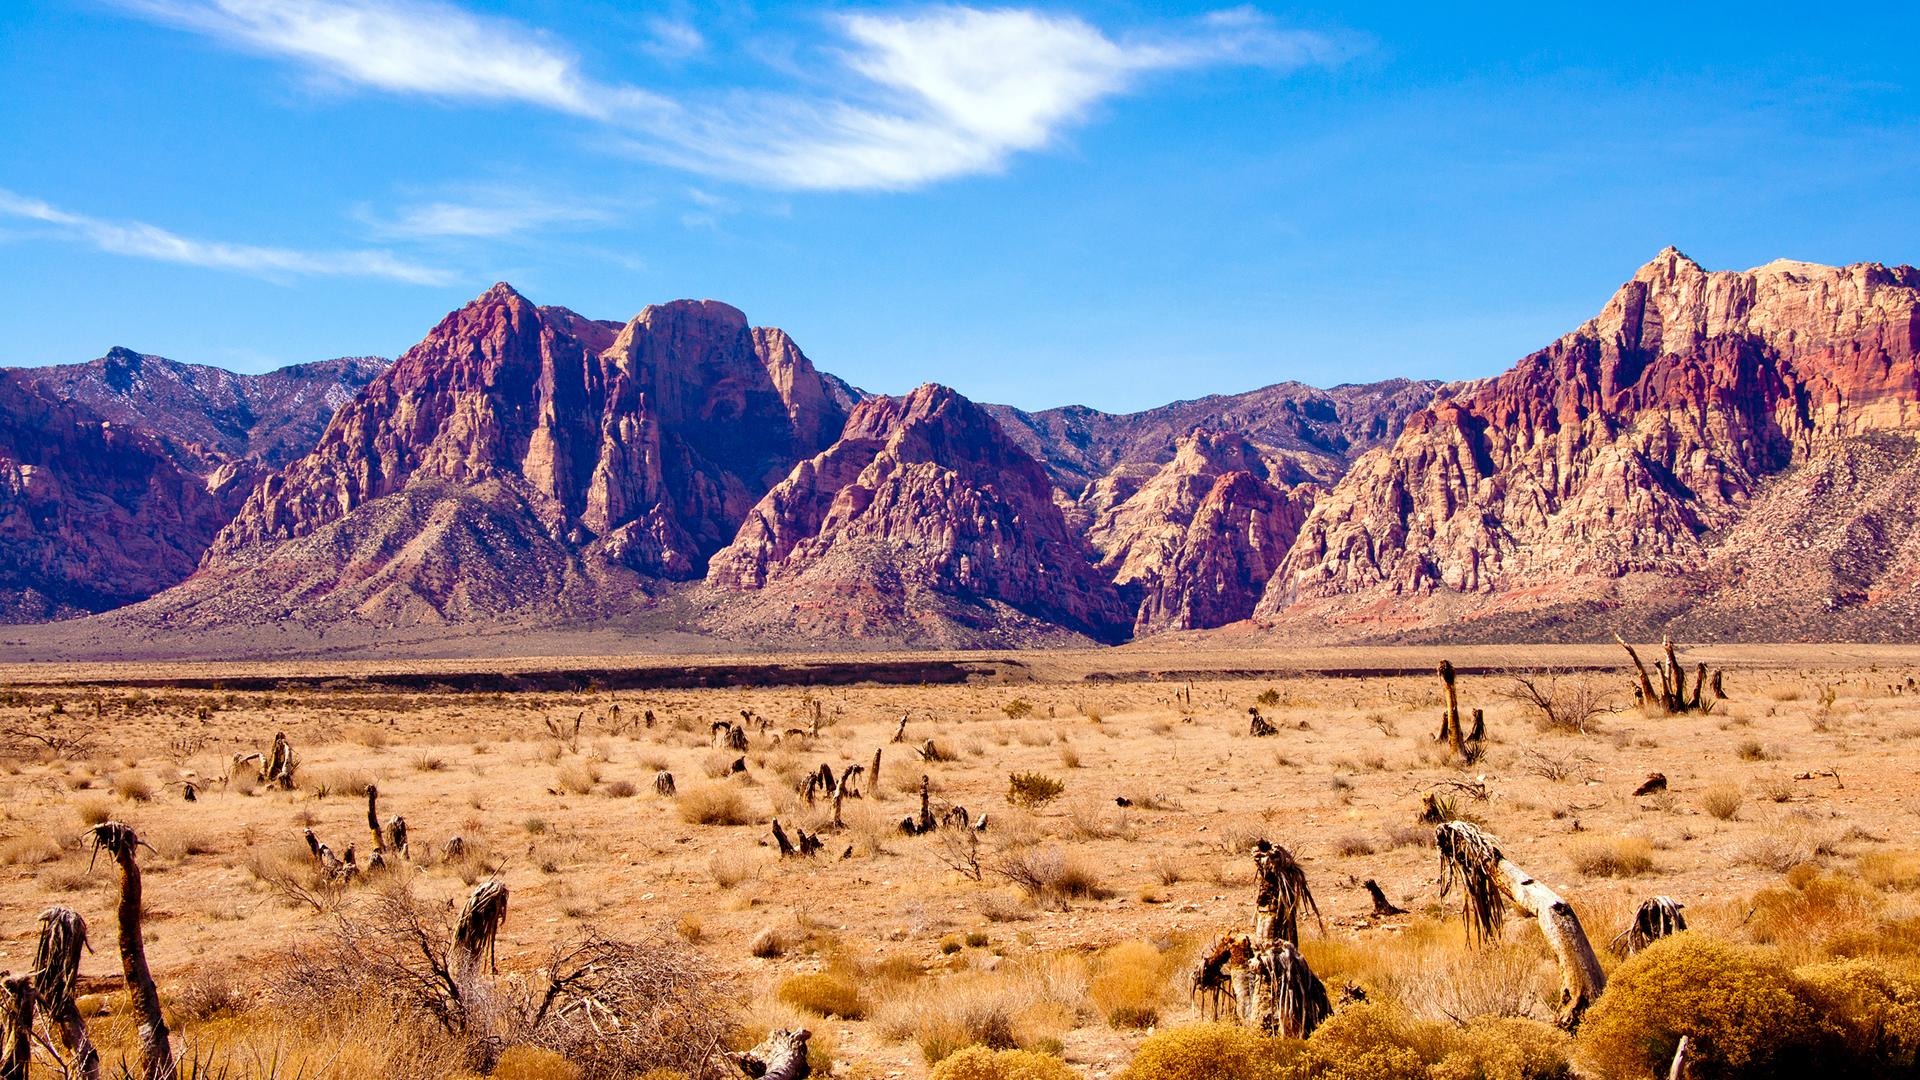 Desert Backgrounds Pictures - Wallpaper Cave